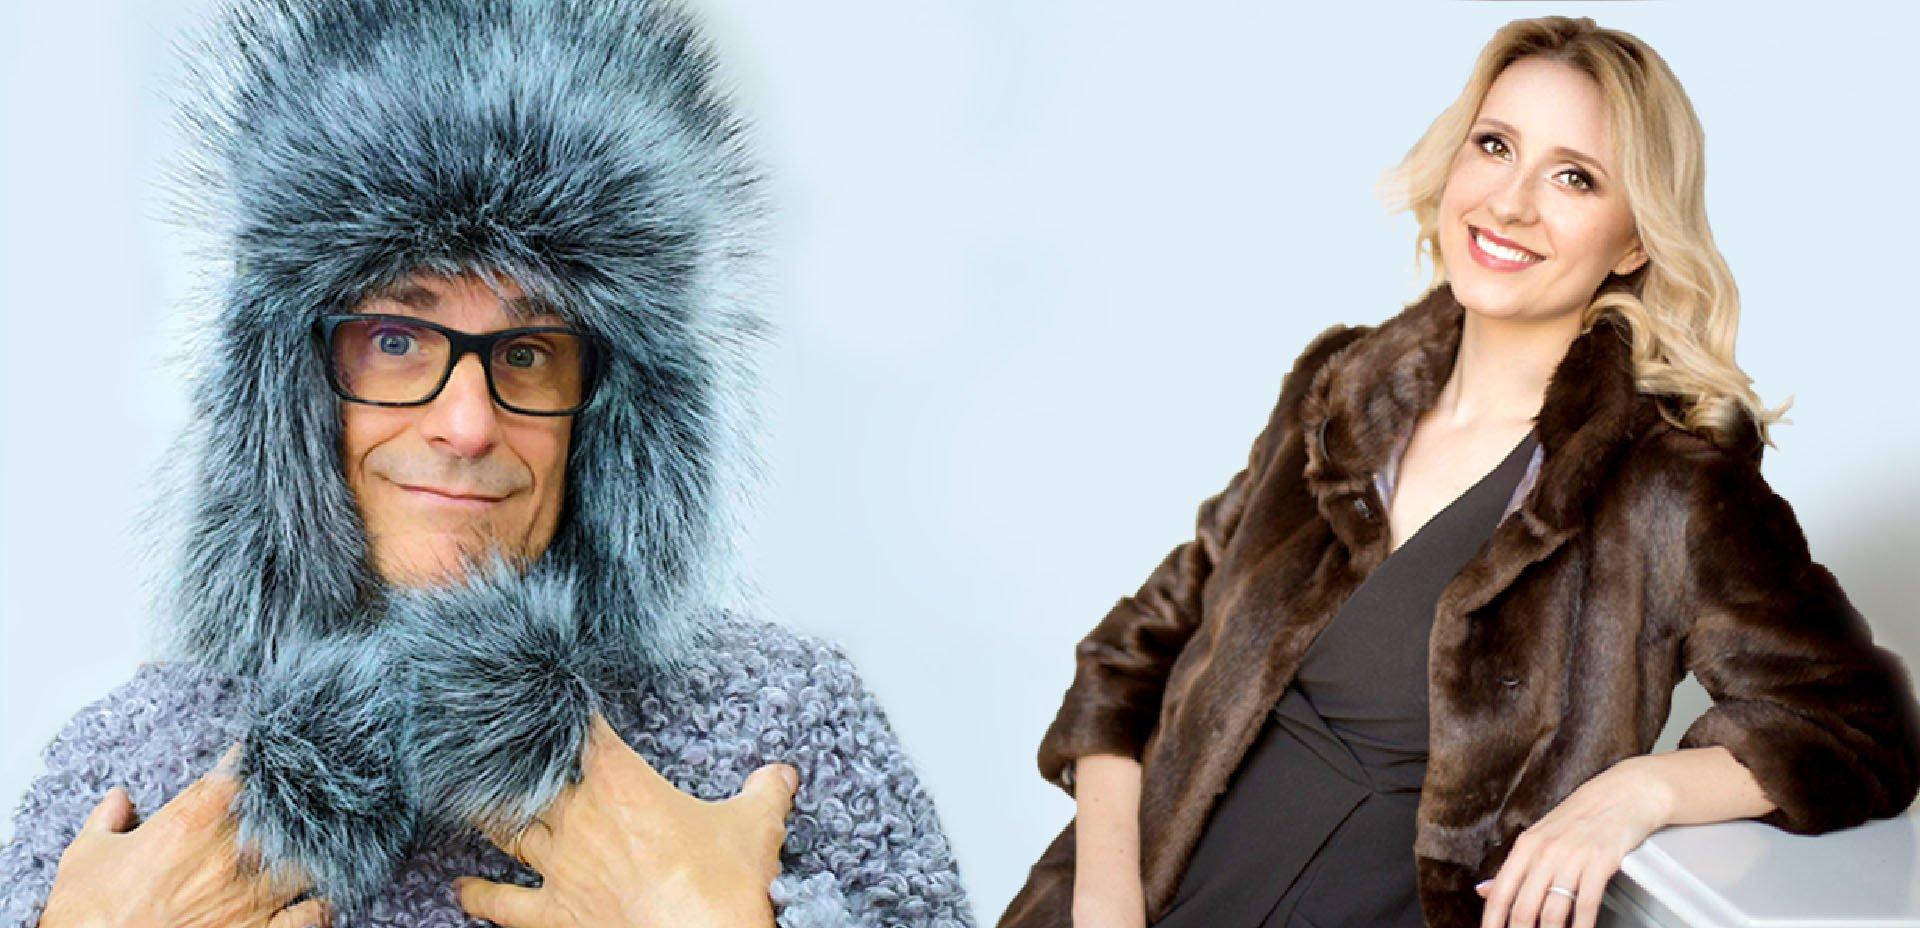 Massimo Leopardi in pelliccia sintetica